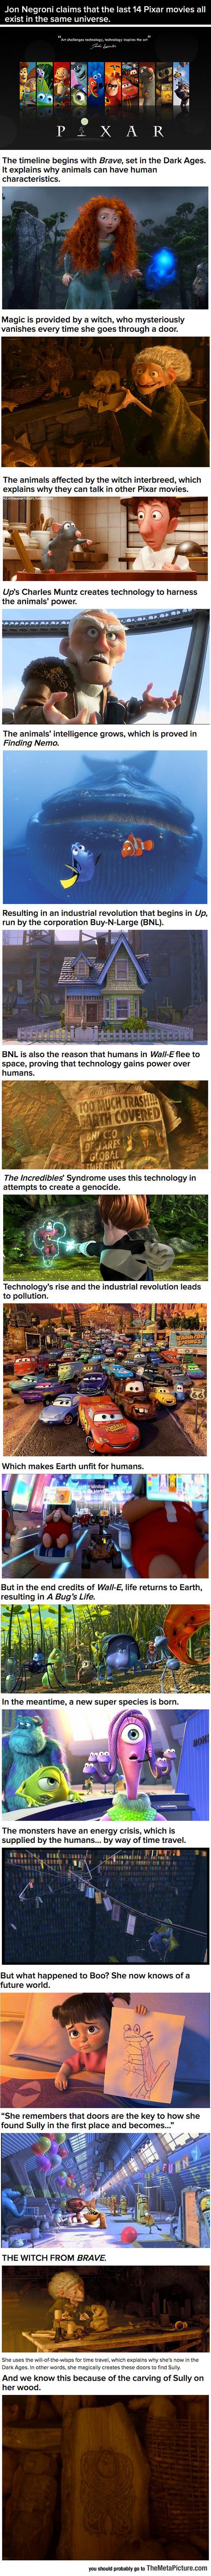 funny-Pixar-movies-same-universe-Brave-animals